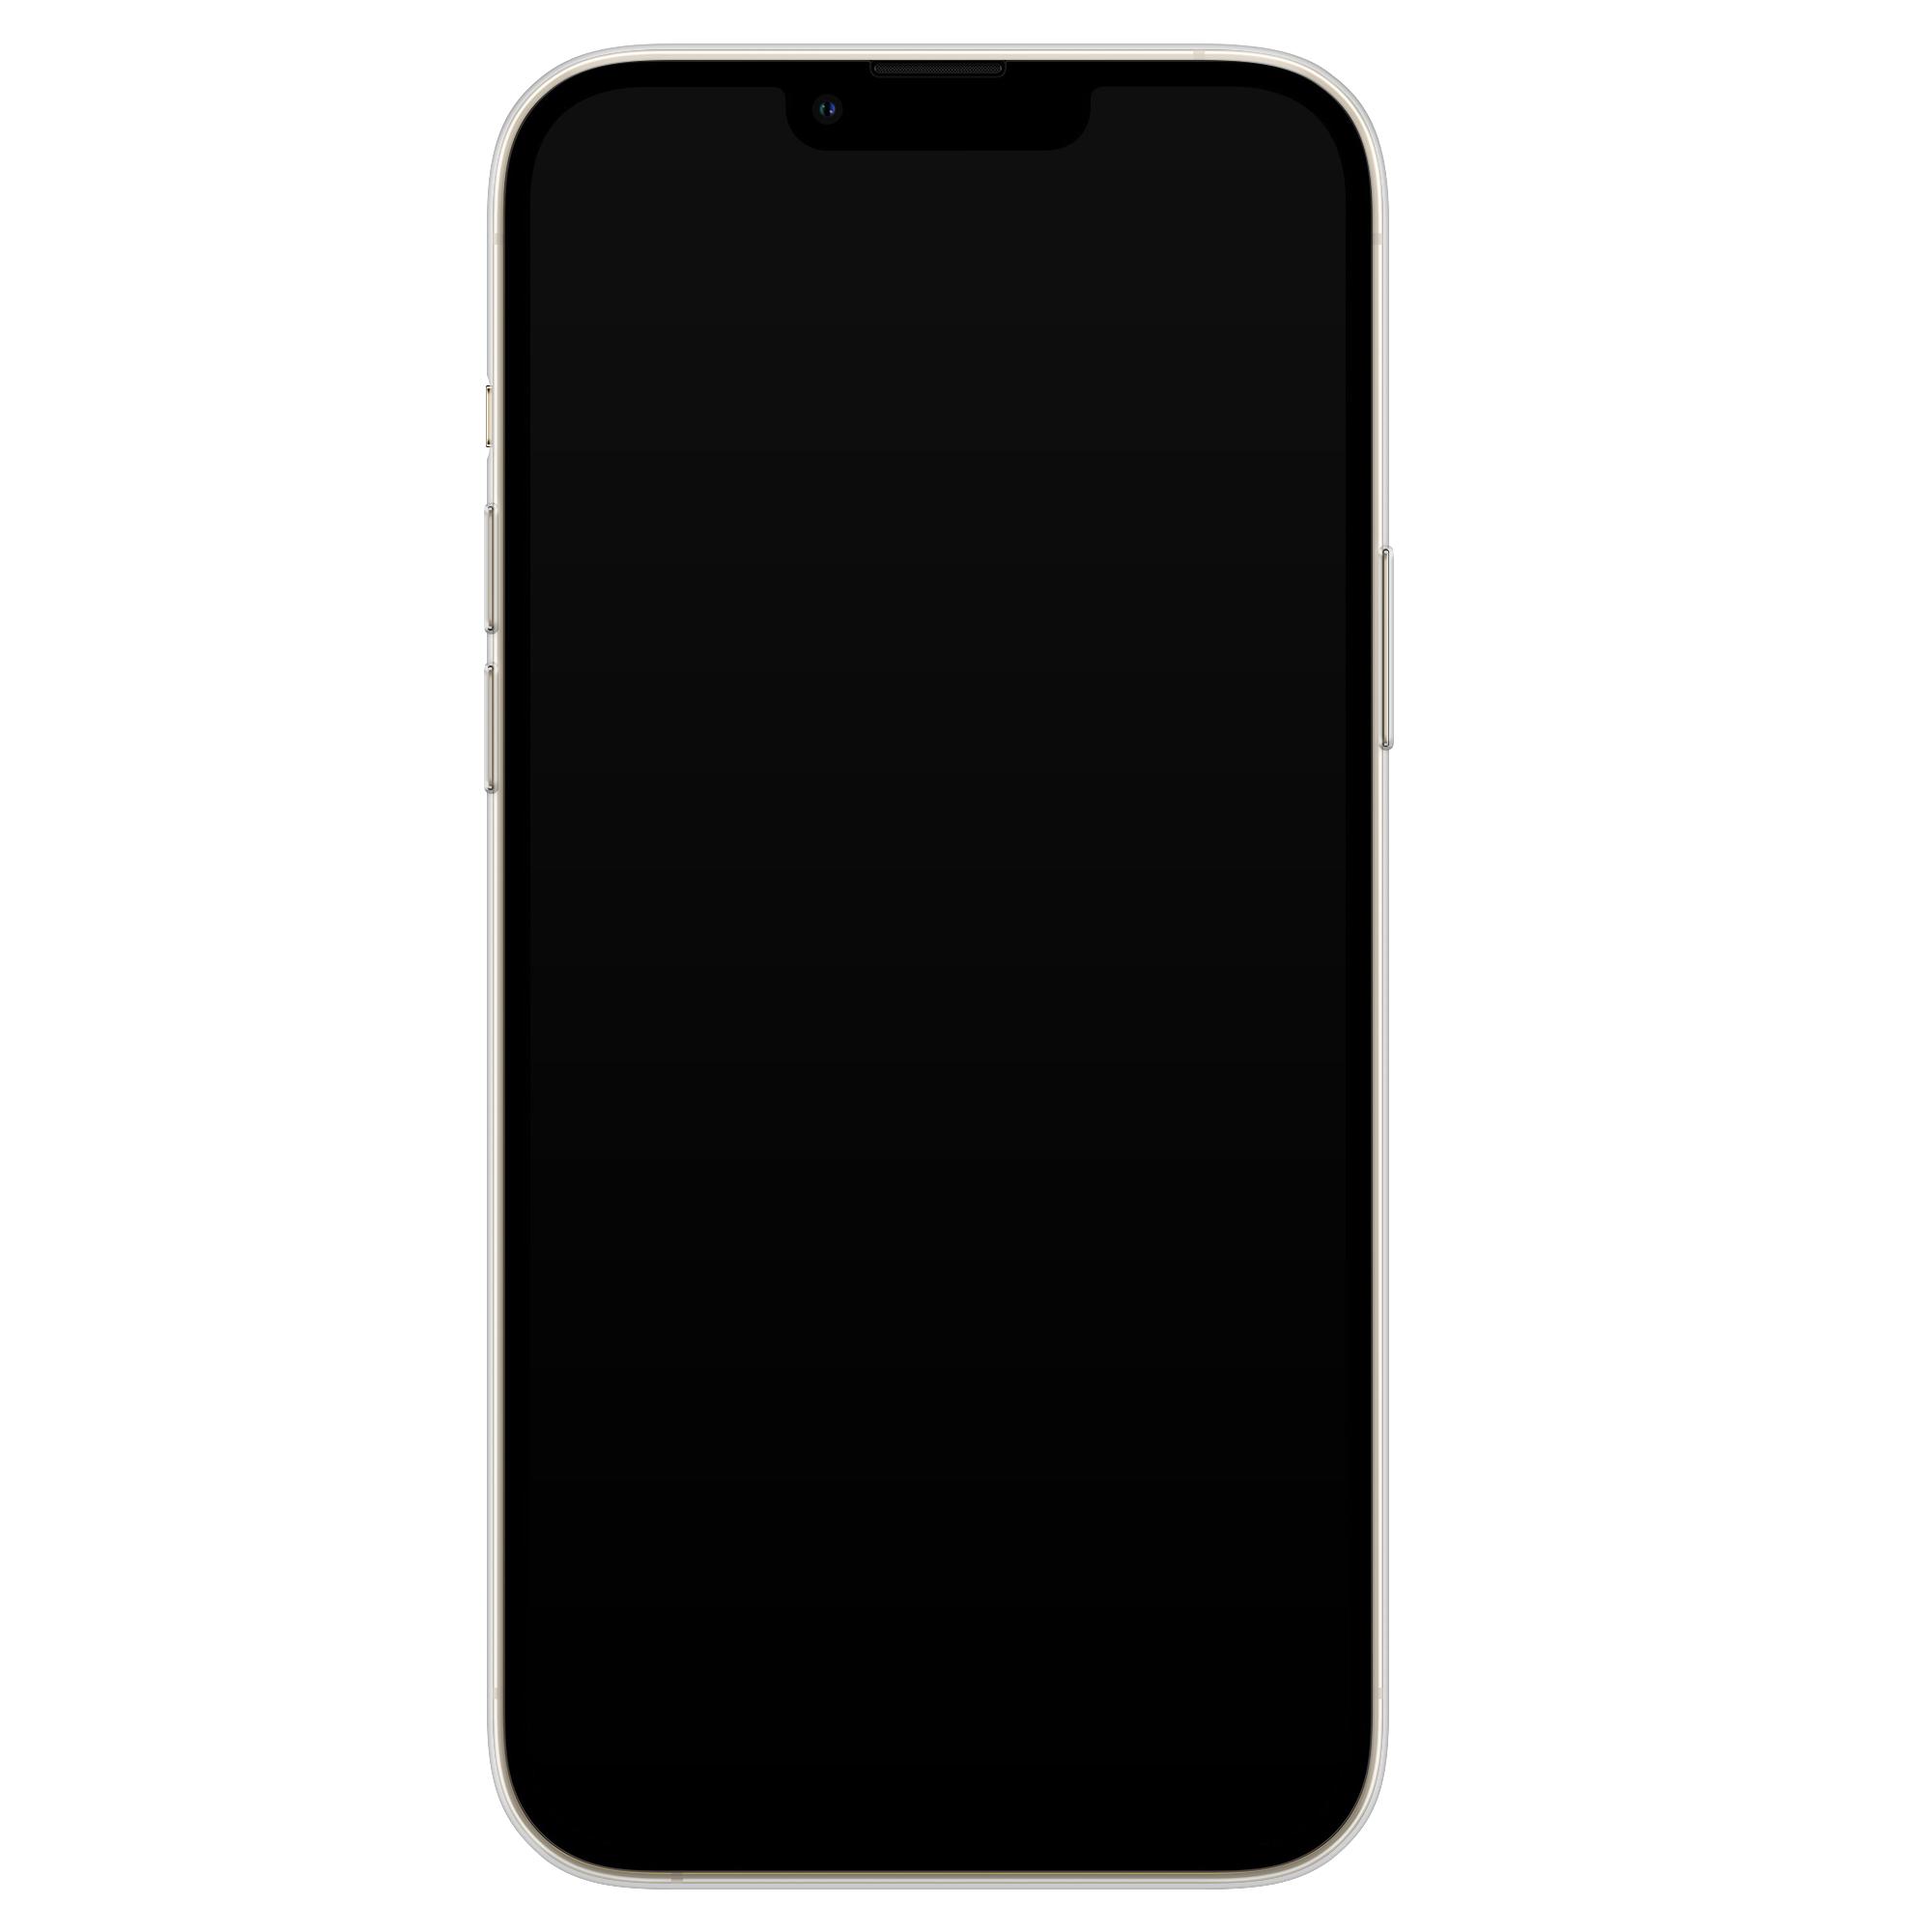 Leuke Telefoonhoesjes iPhone 13 Pro Max siliconen hoesje - Baby leo